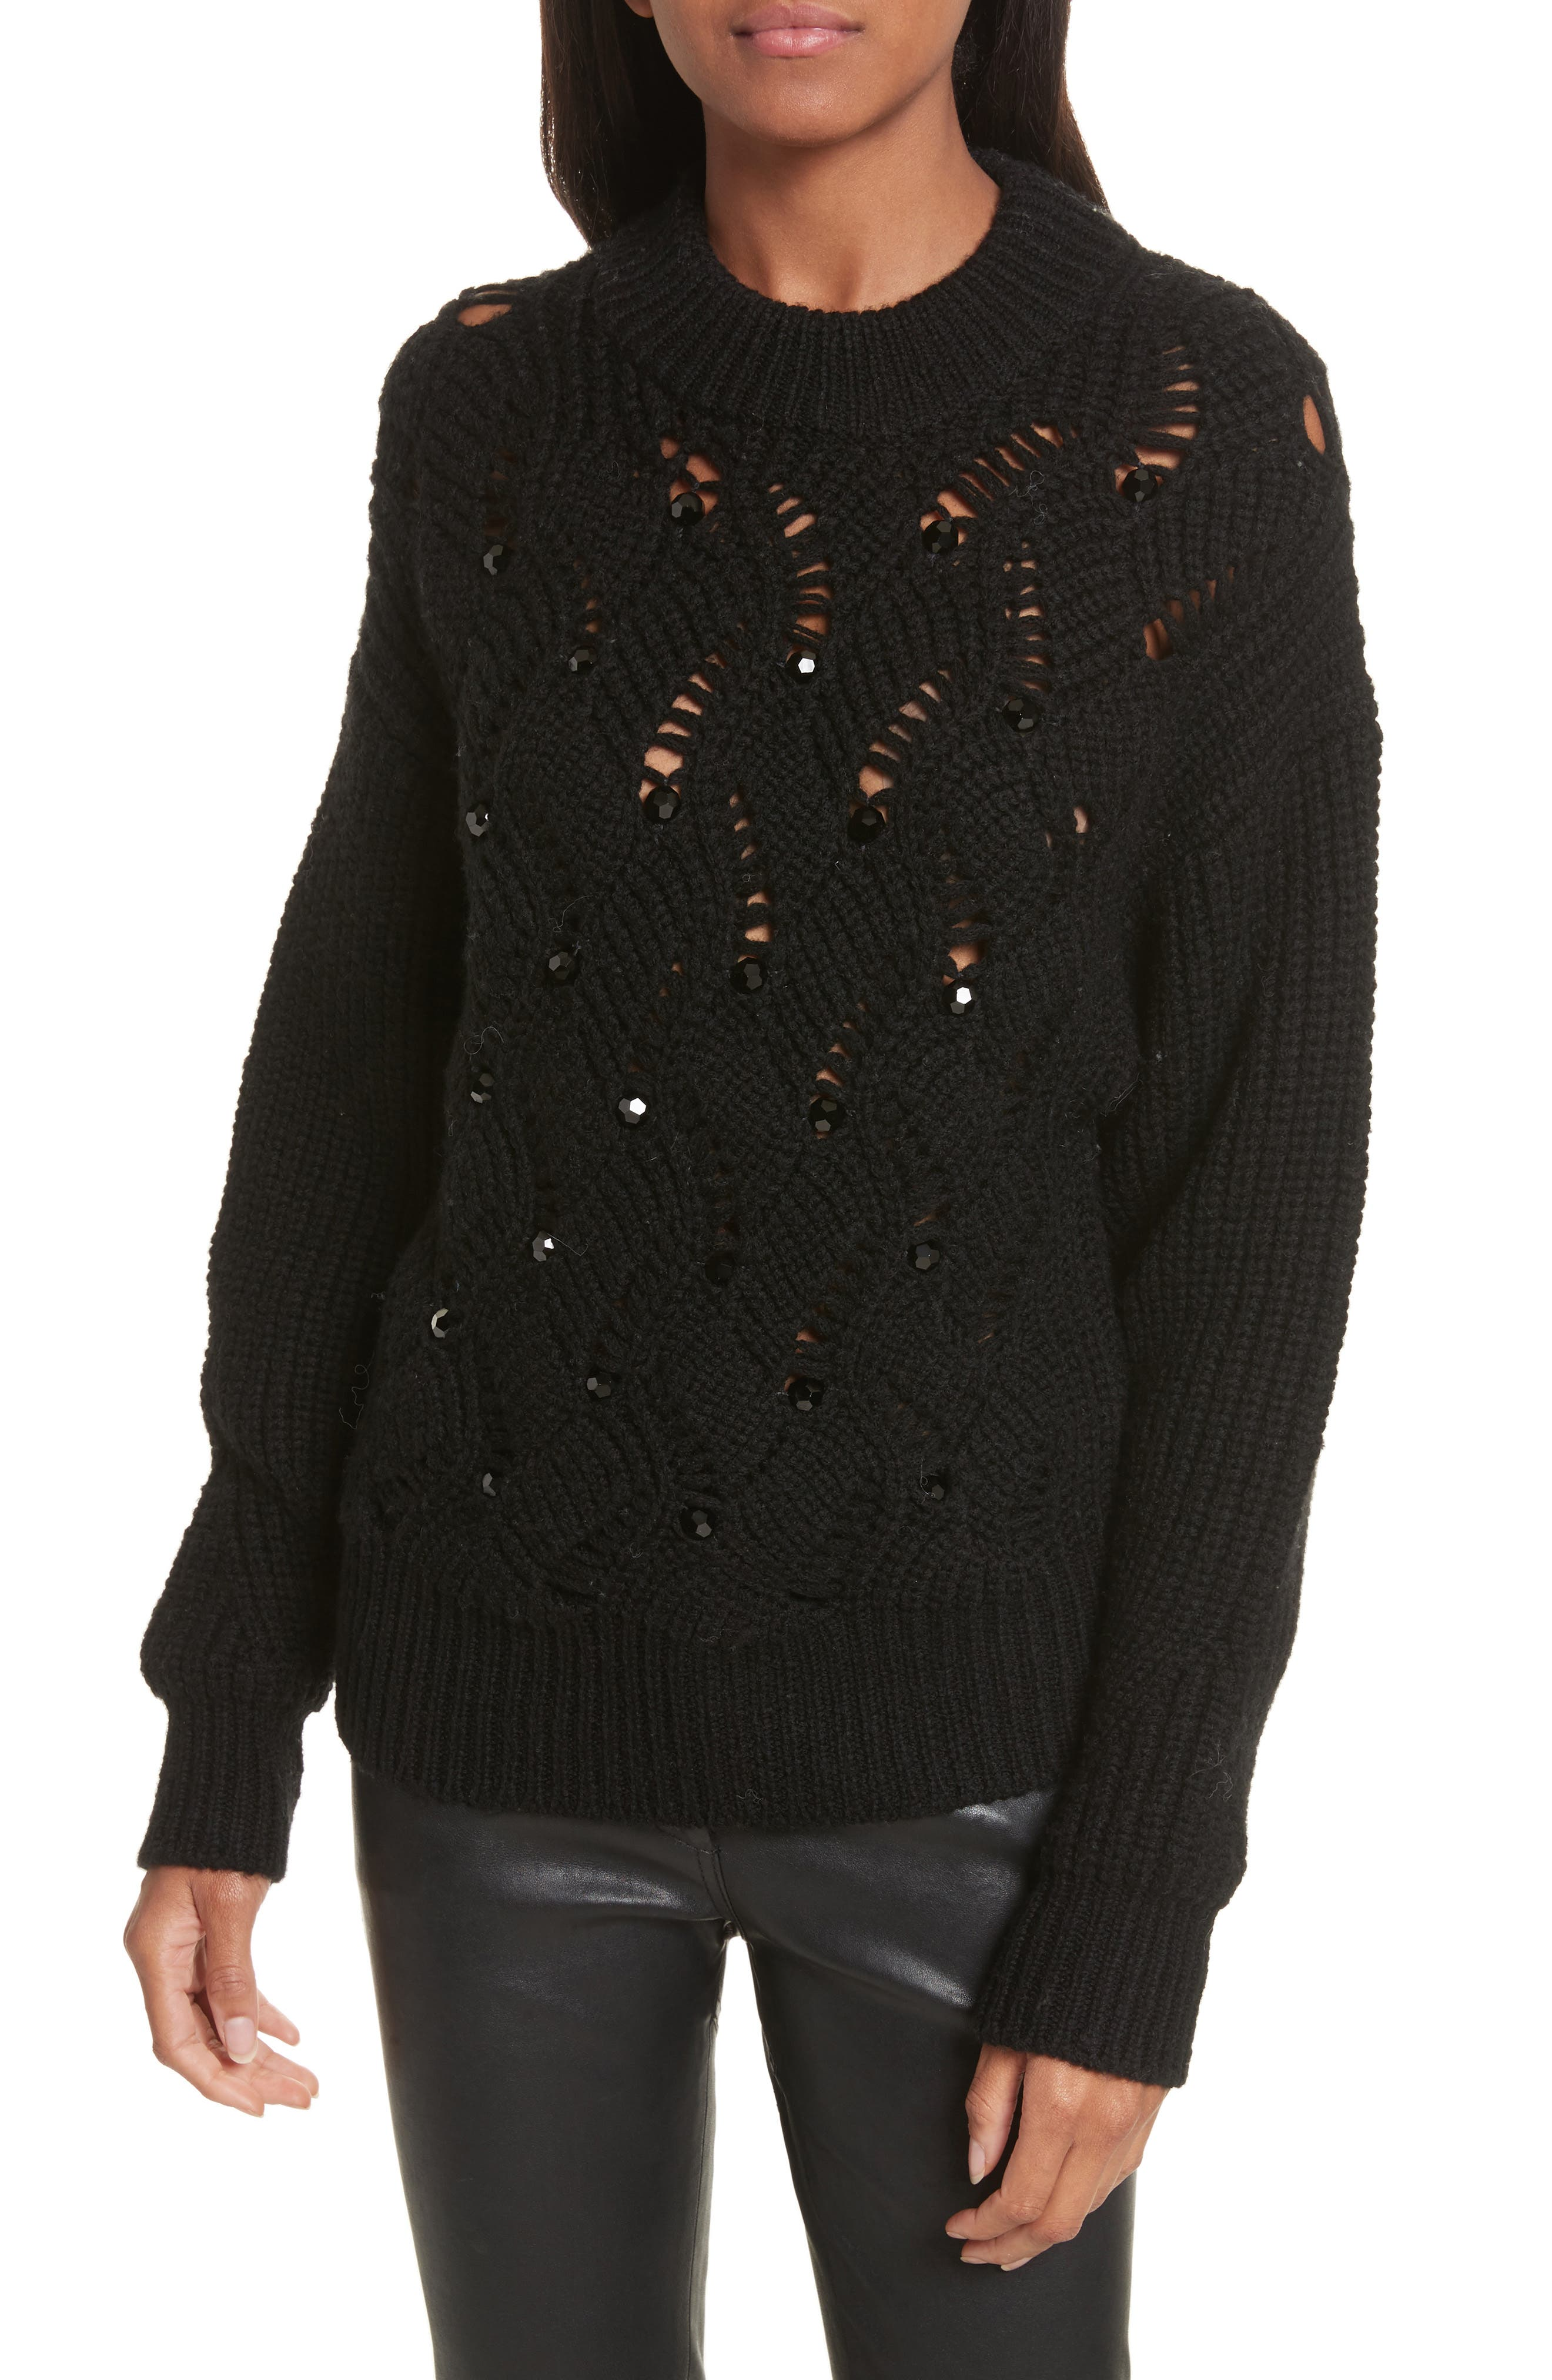 Alternate Image 1 Selected - Rebecca Taylor Embellished Wool Blend Sweater